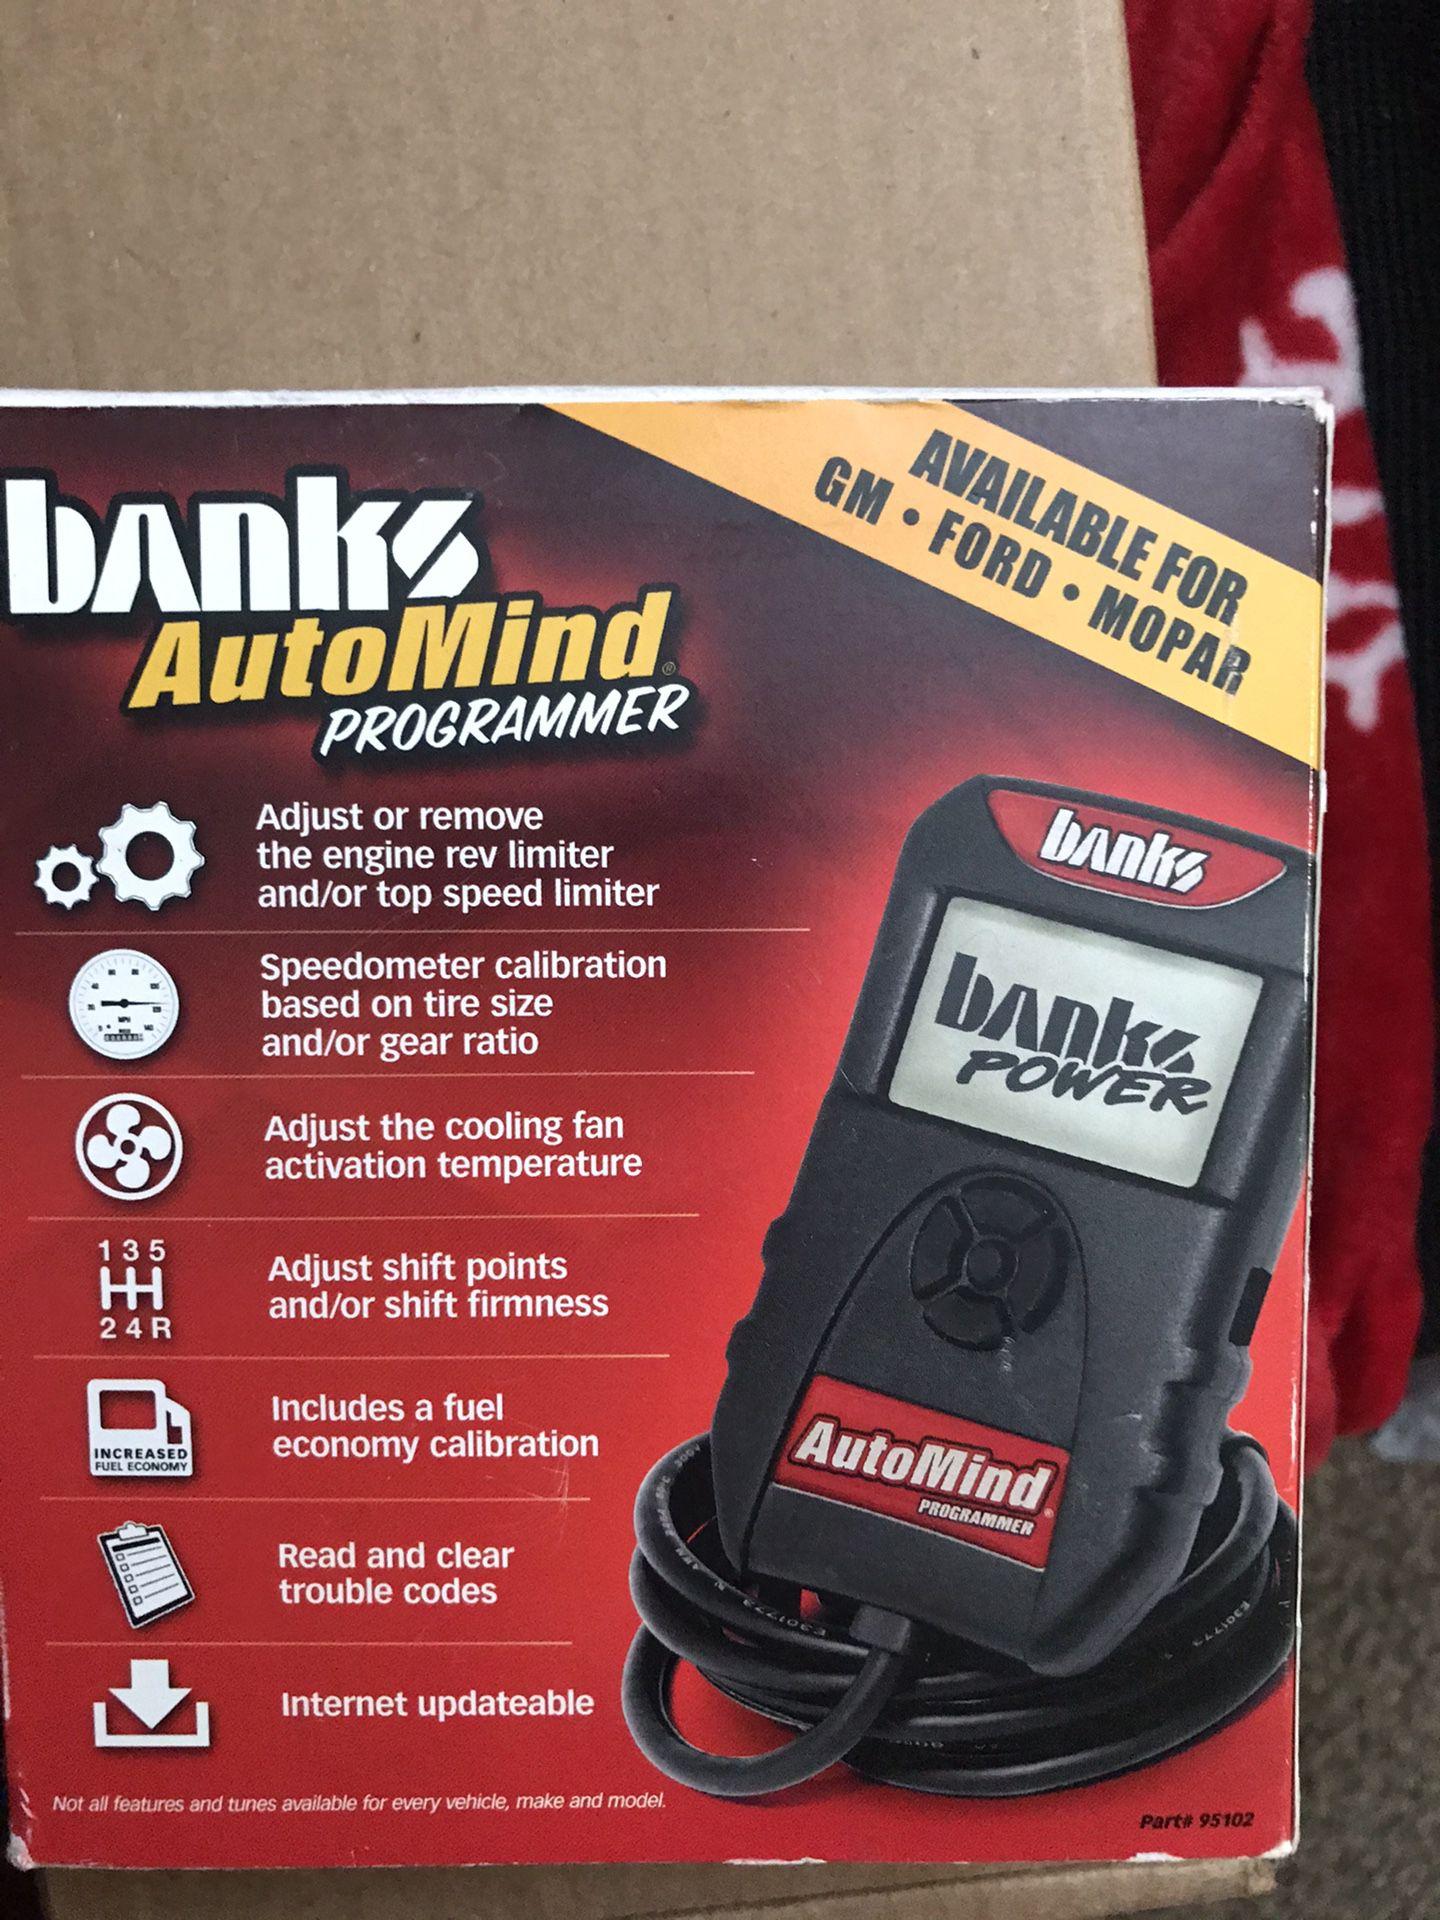 Banks Power tuner